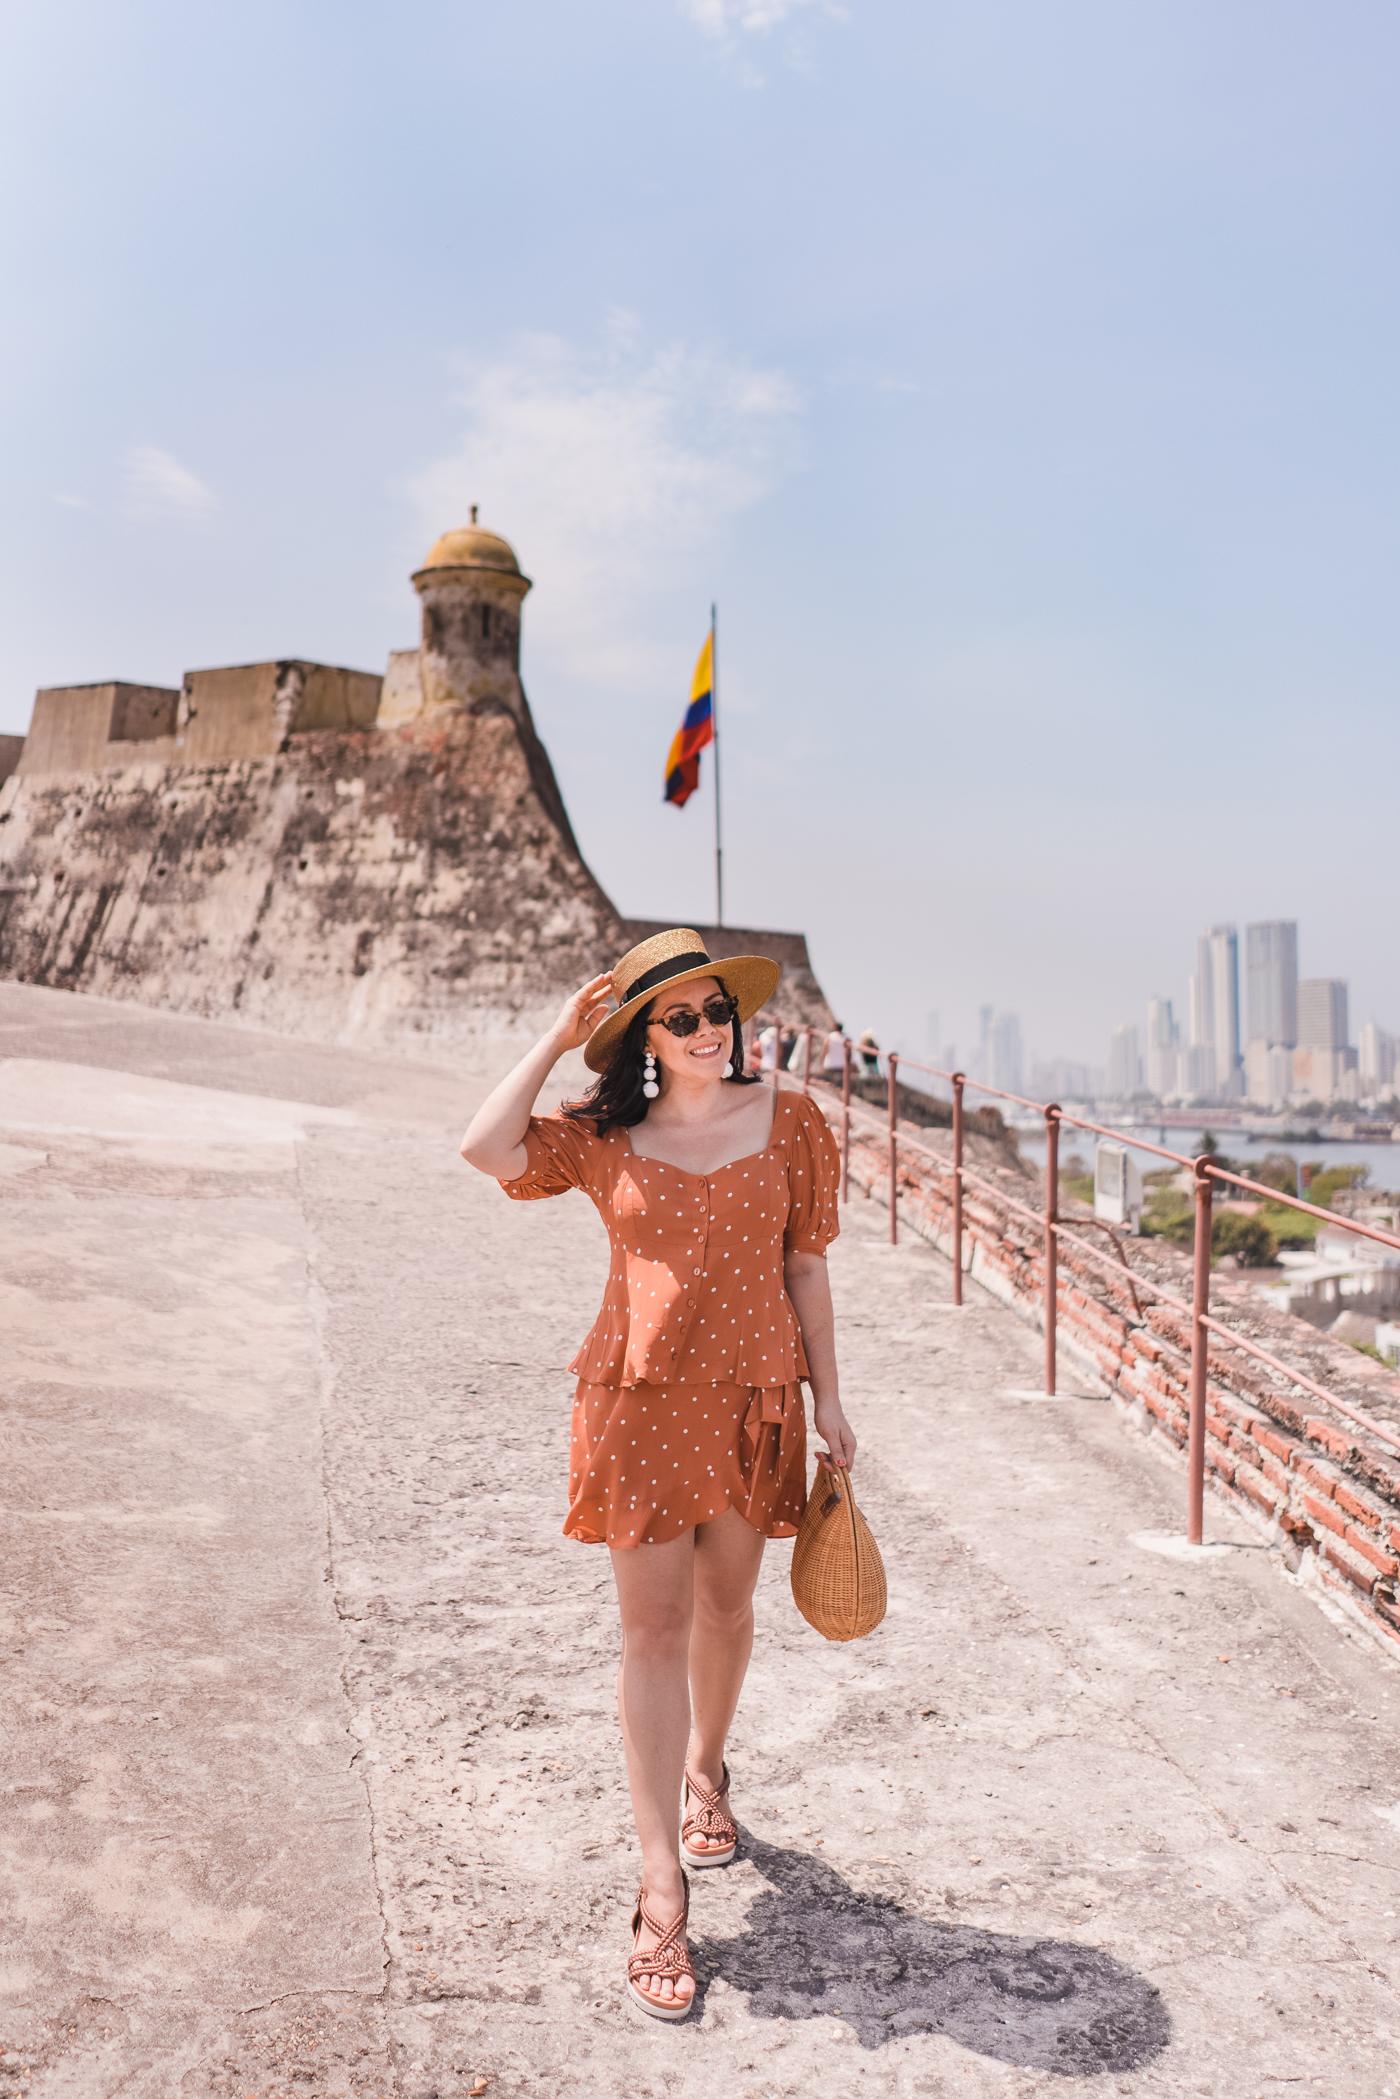 Top Attractions in Cartagena